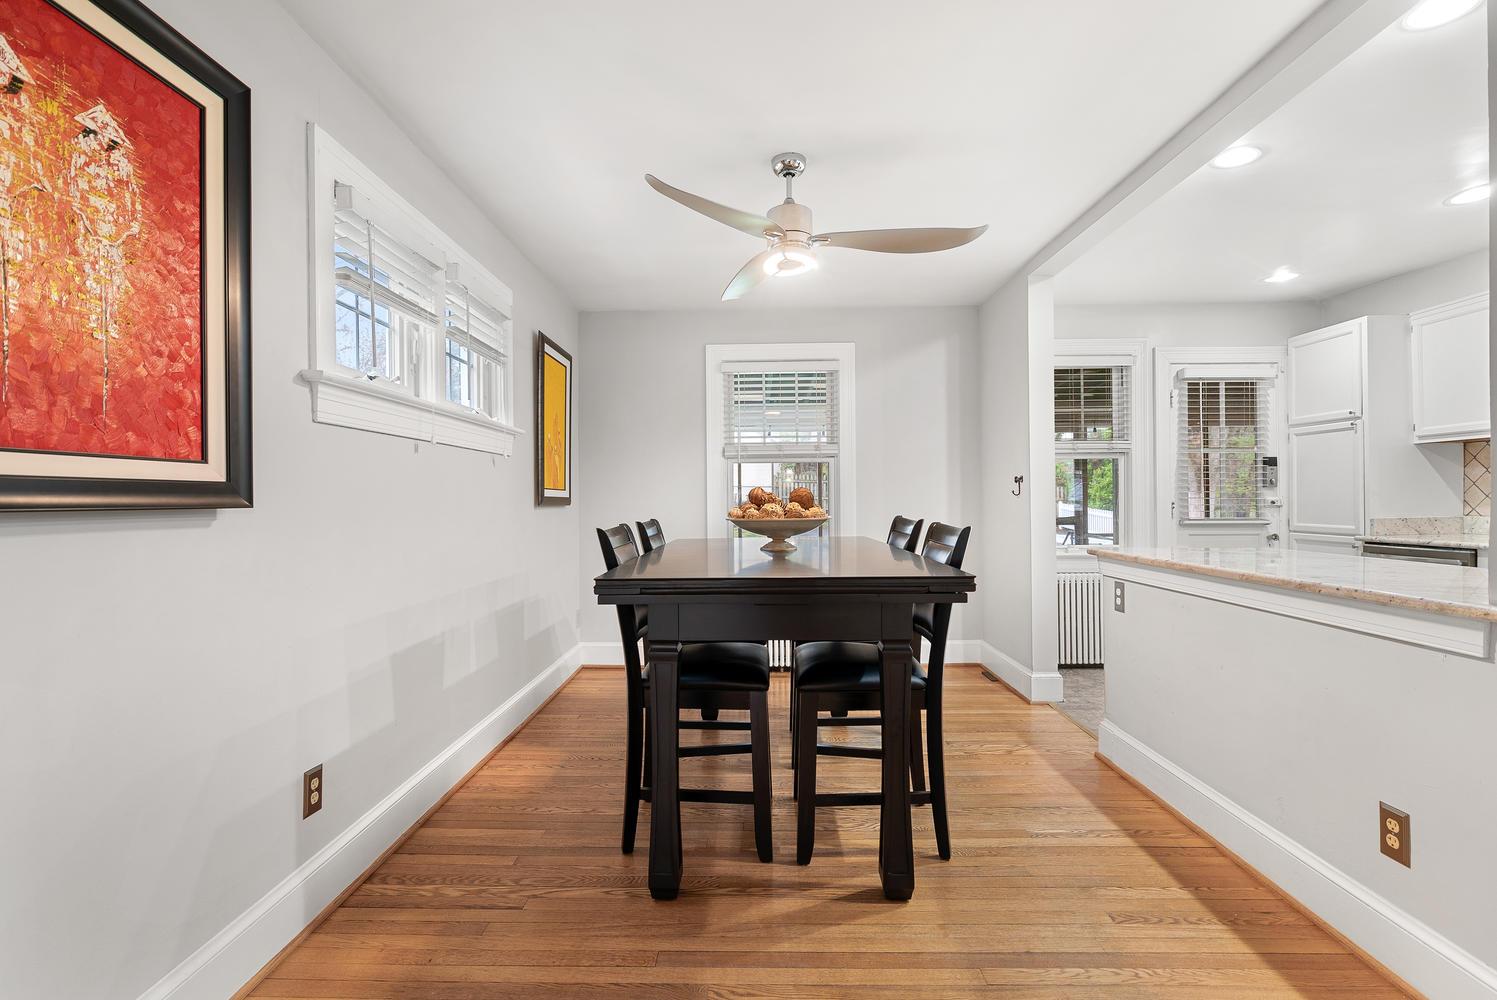 9111 Louis Ave-large-013-025-Interior-1498×1000-72dpi